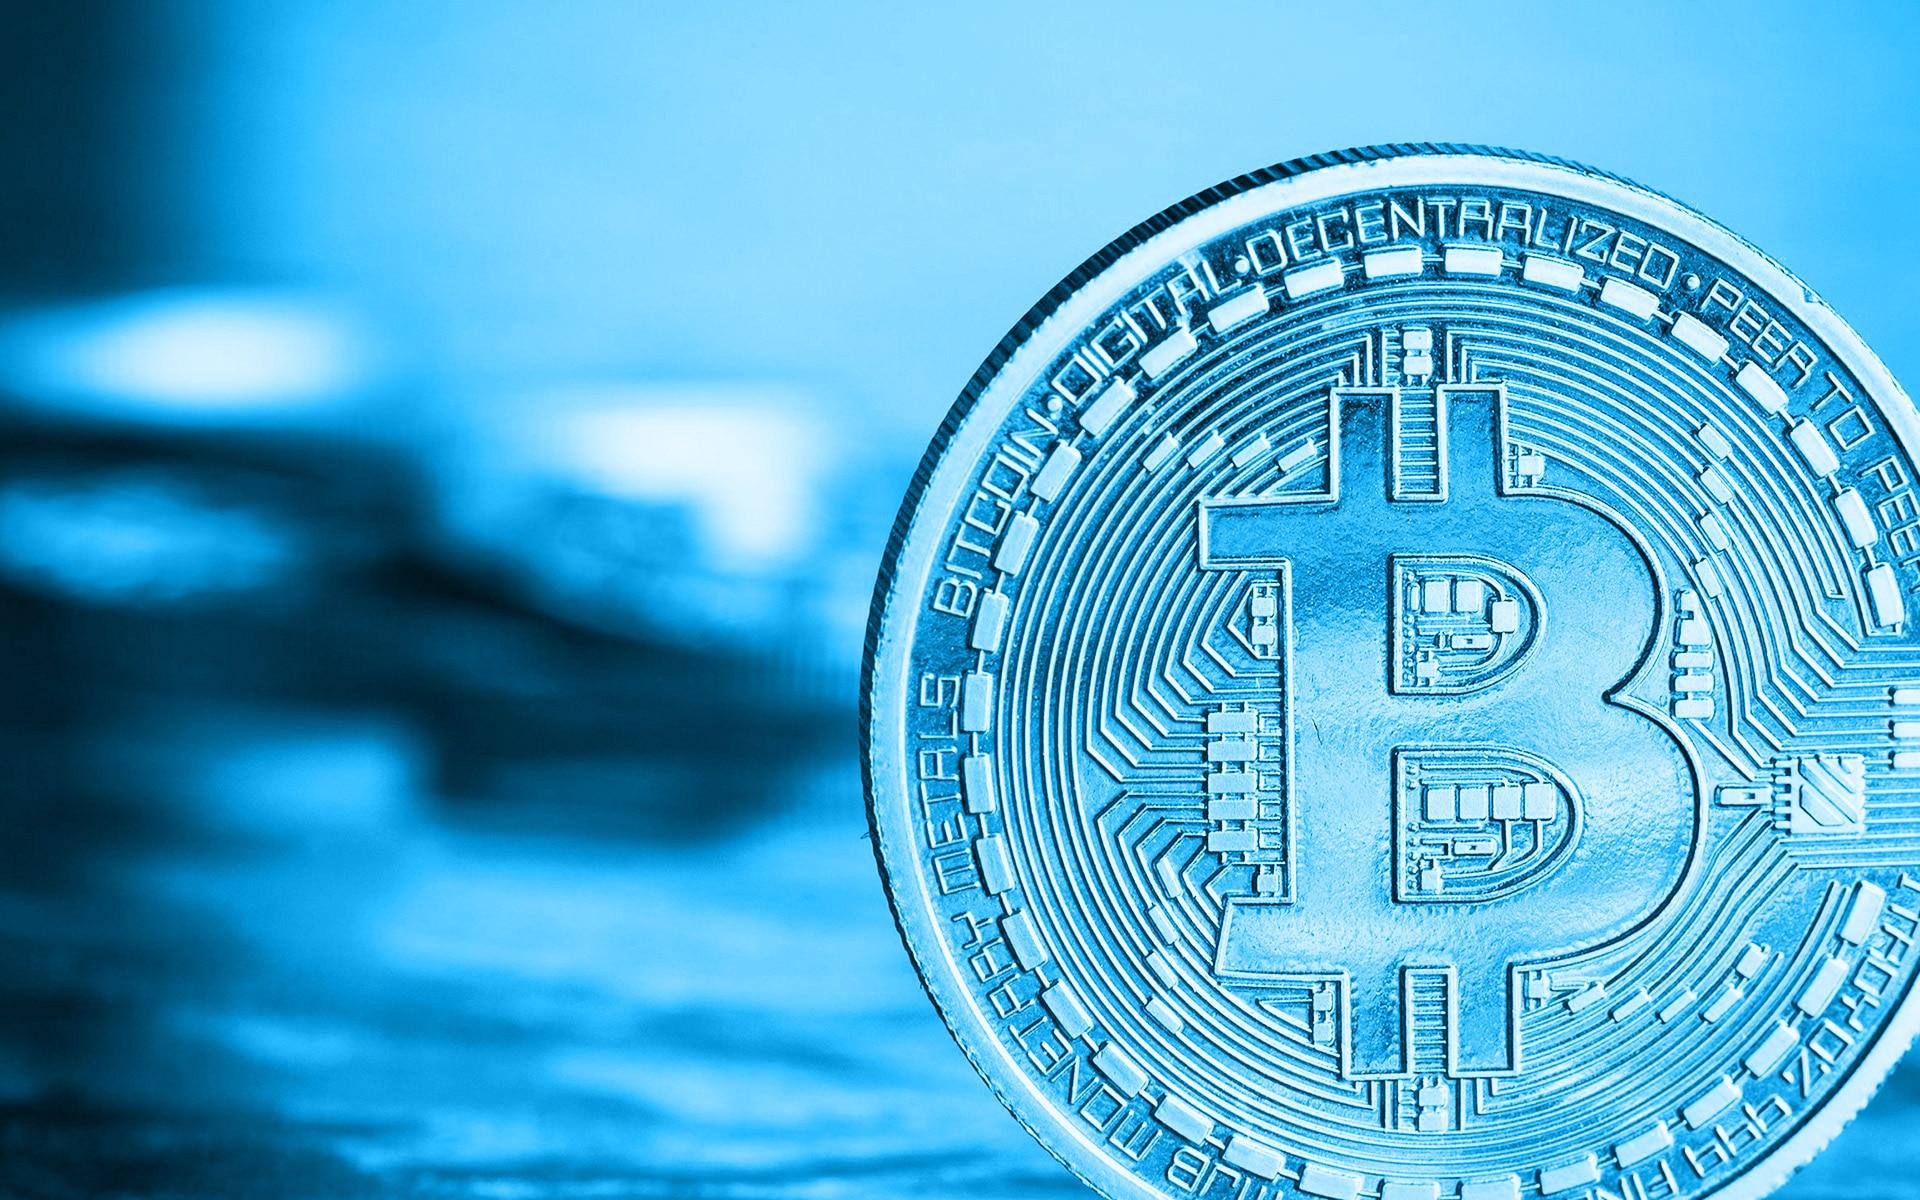 criptomonedas-bitcoin-criptomoneda-moneda virtual-critpodivisa-monedas virtuales-criptodivisas